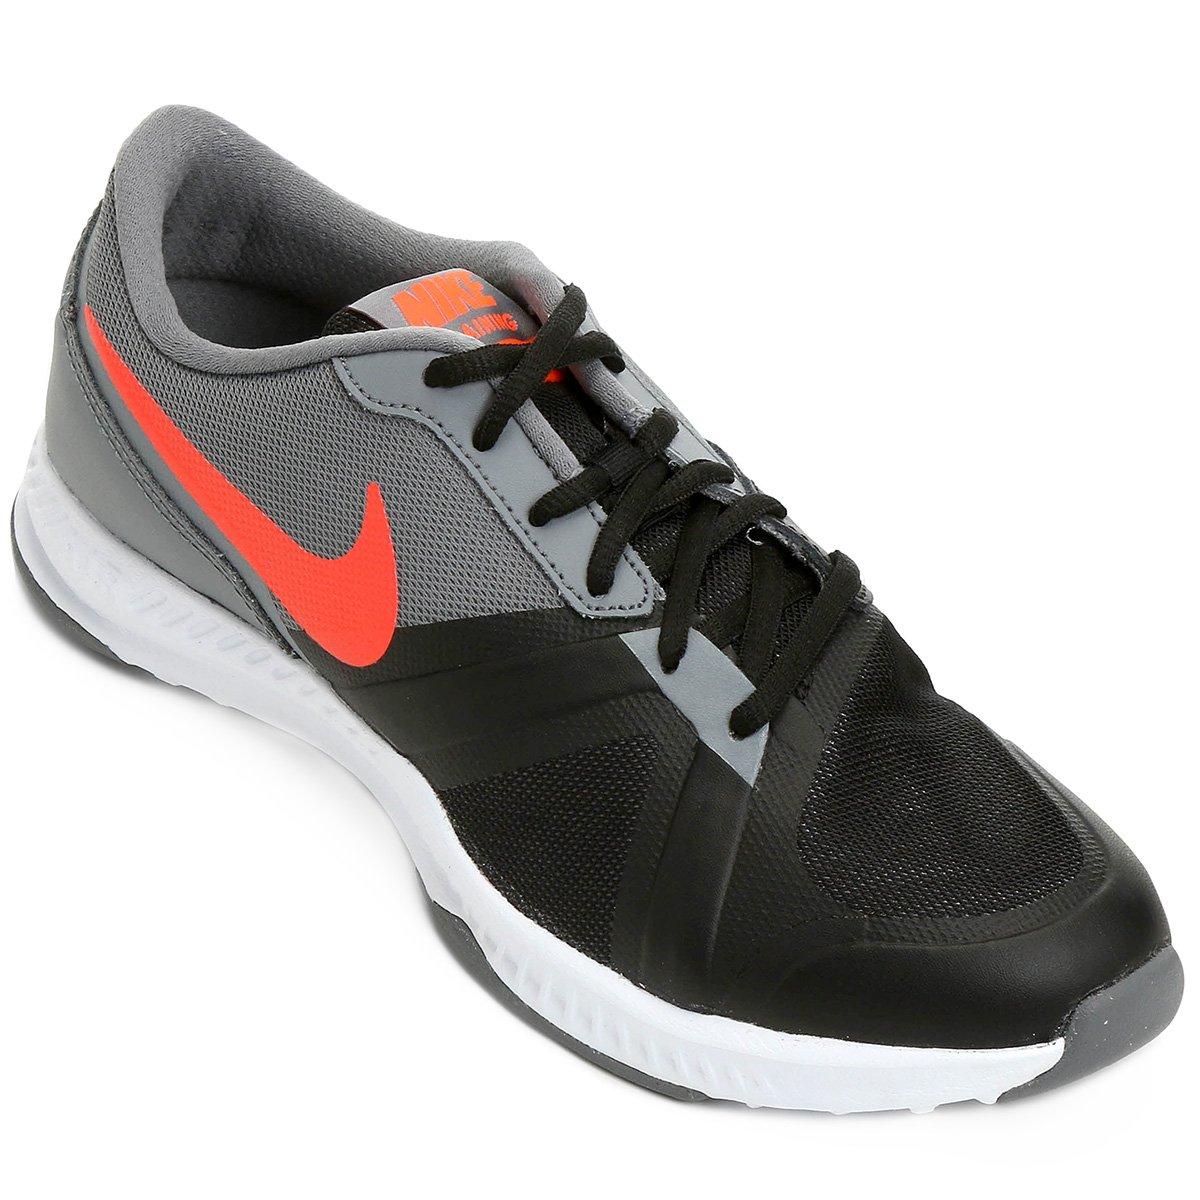 872818b161 Tênis Nike Air Epic Speed Training Masculino - Compre Agora